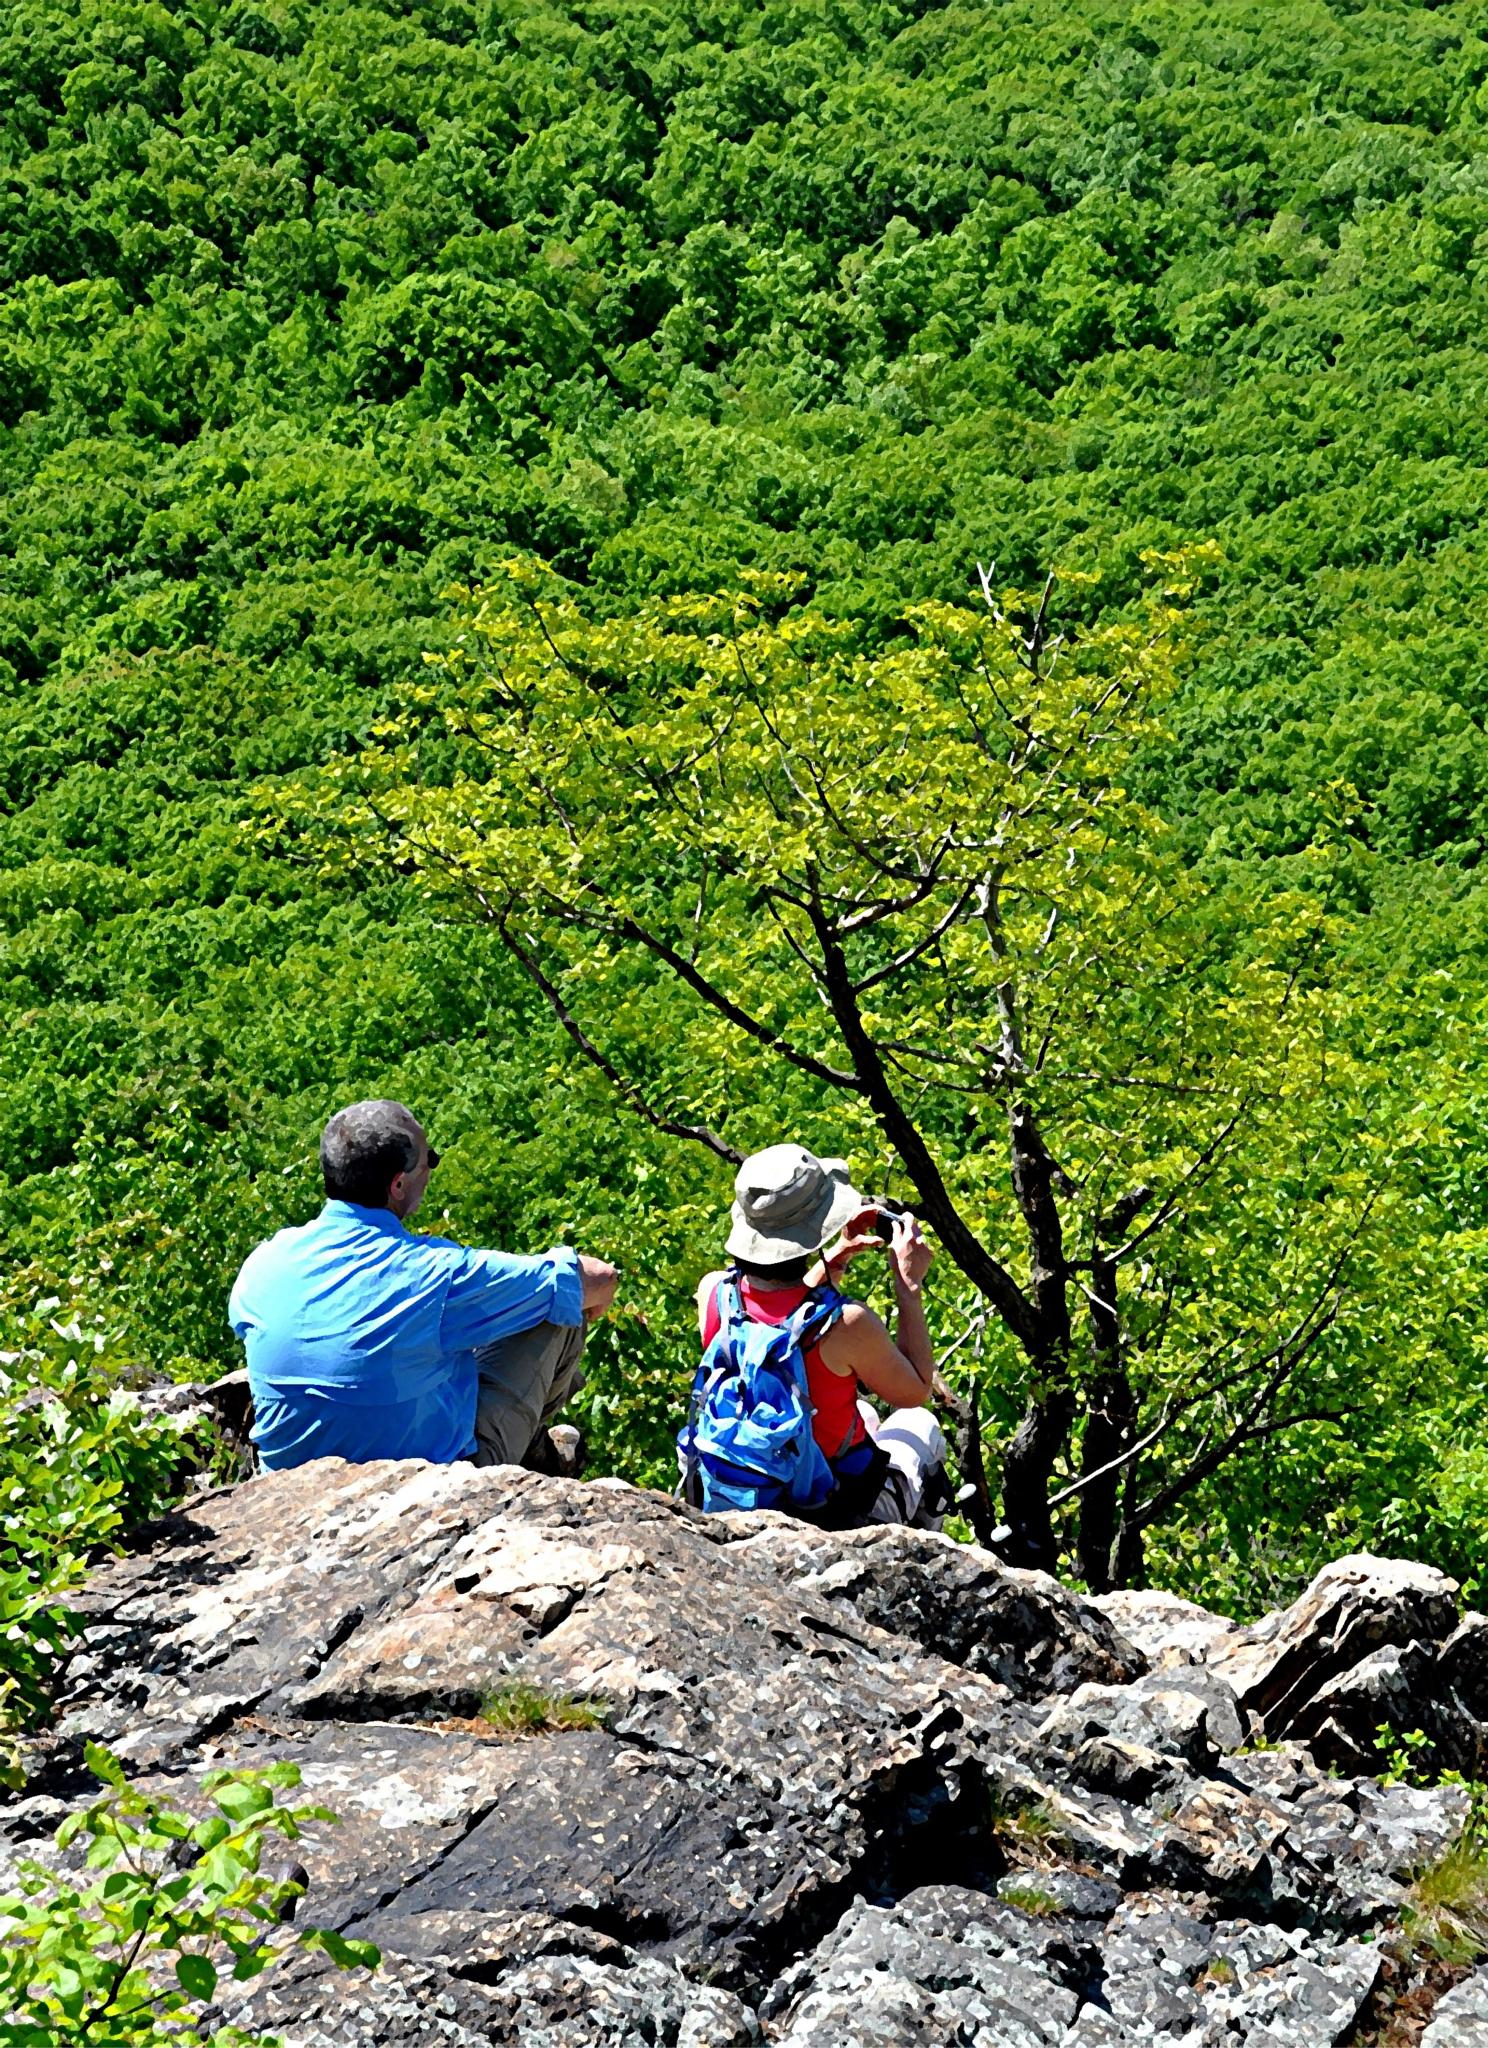 Hiker's View by Joeski